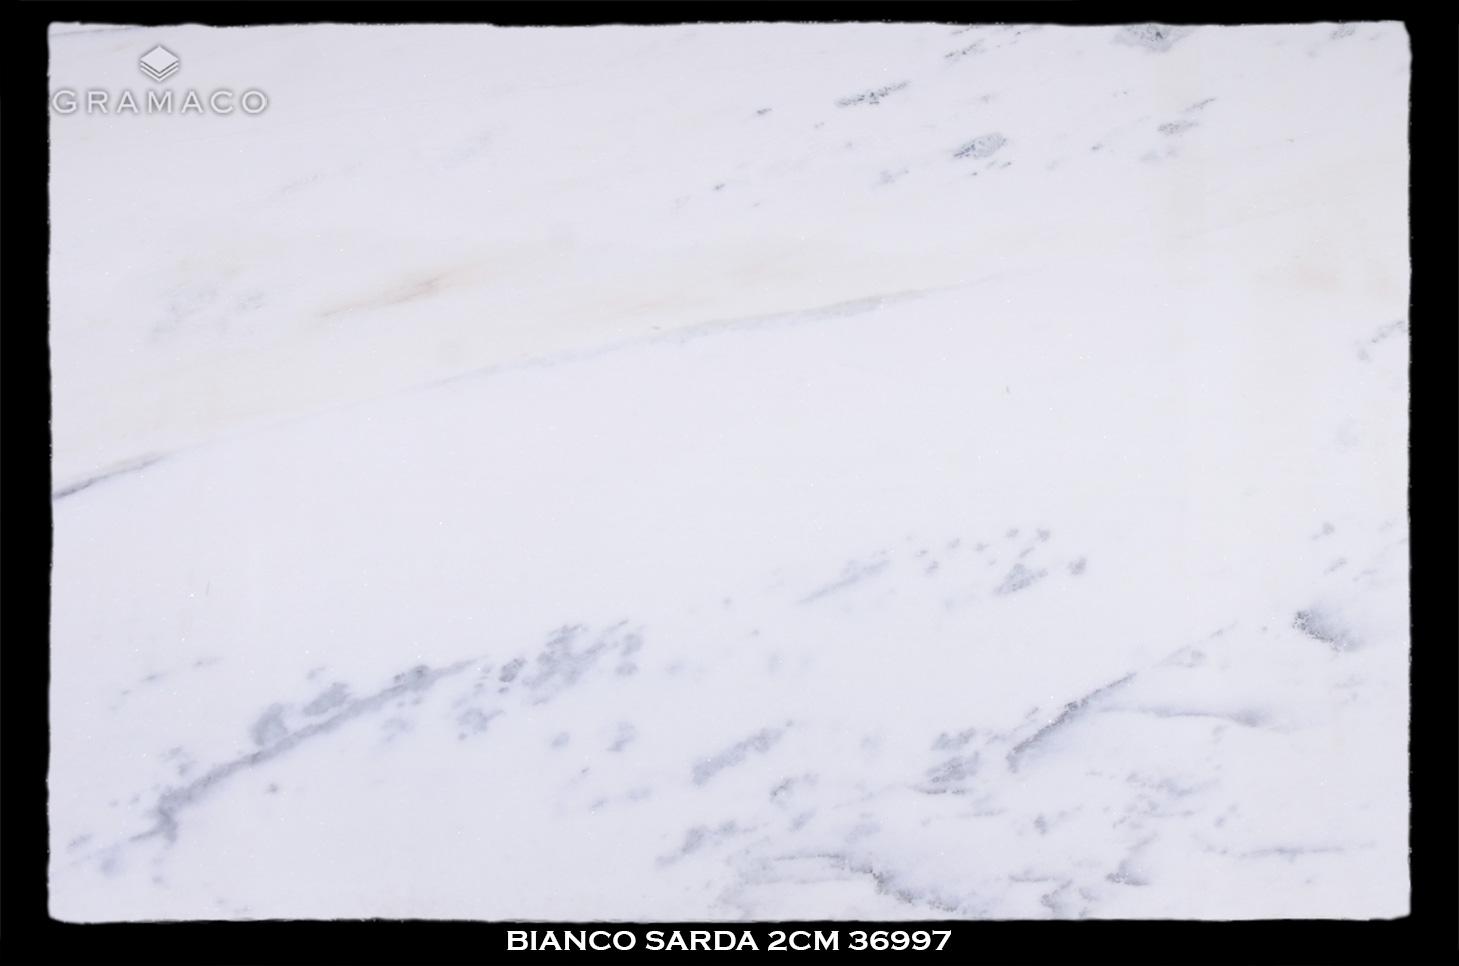 BIANCO-SARDA-2CM-36997-SLAB